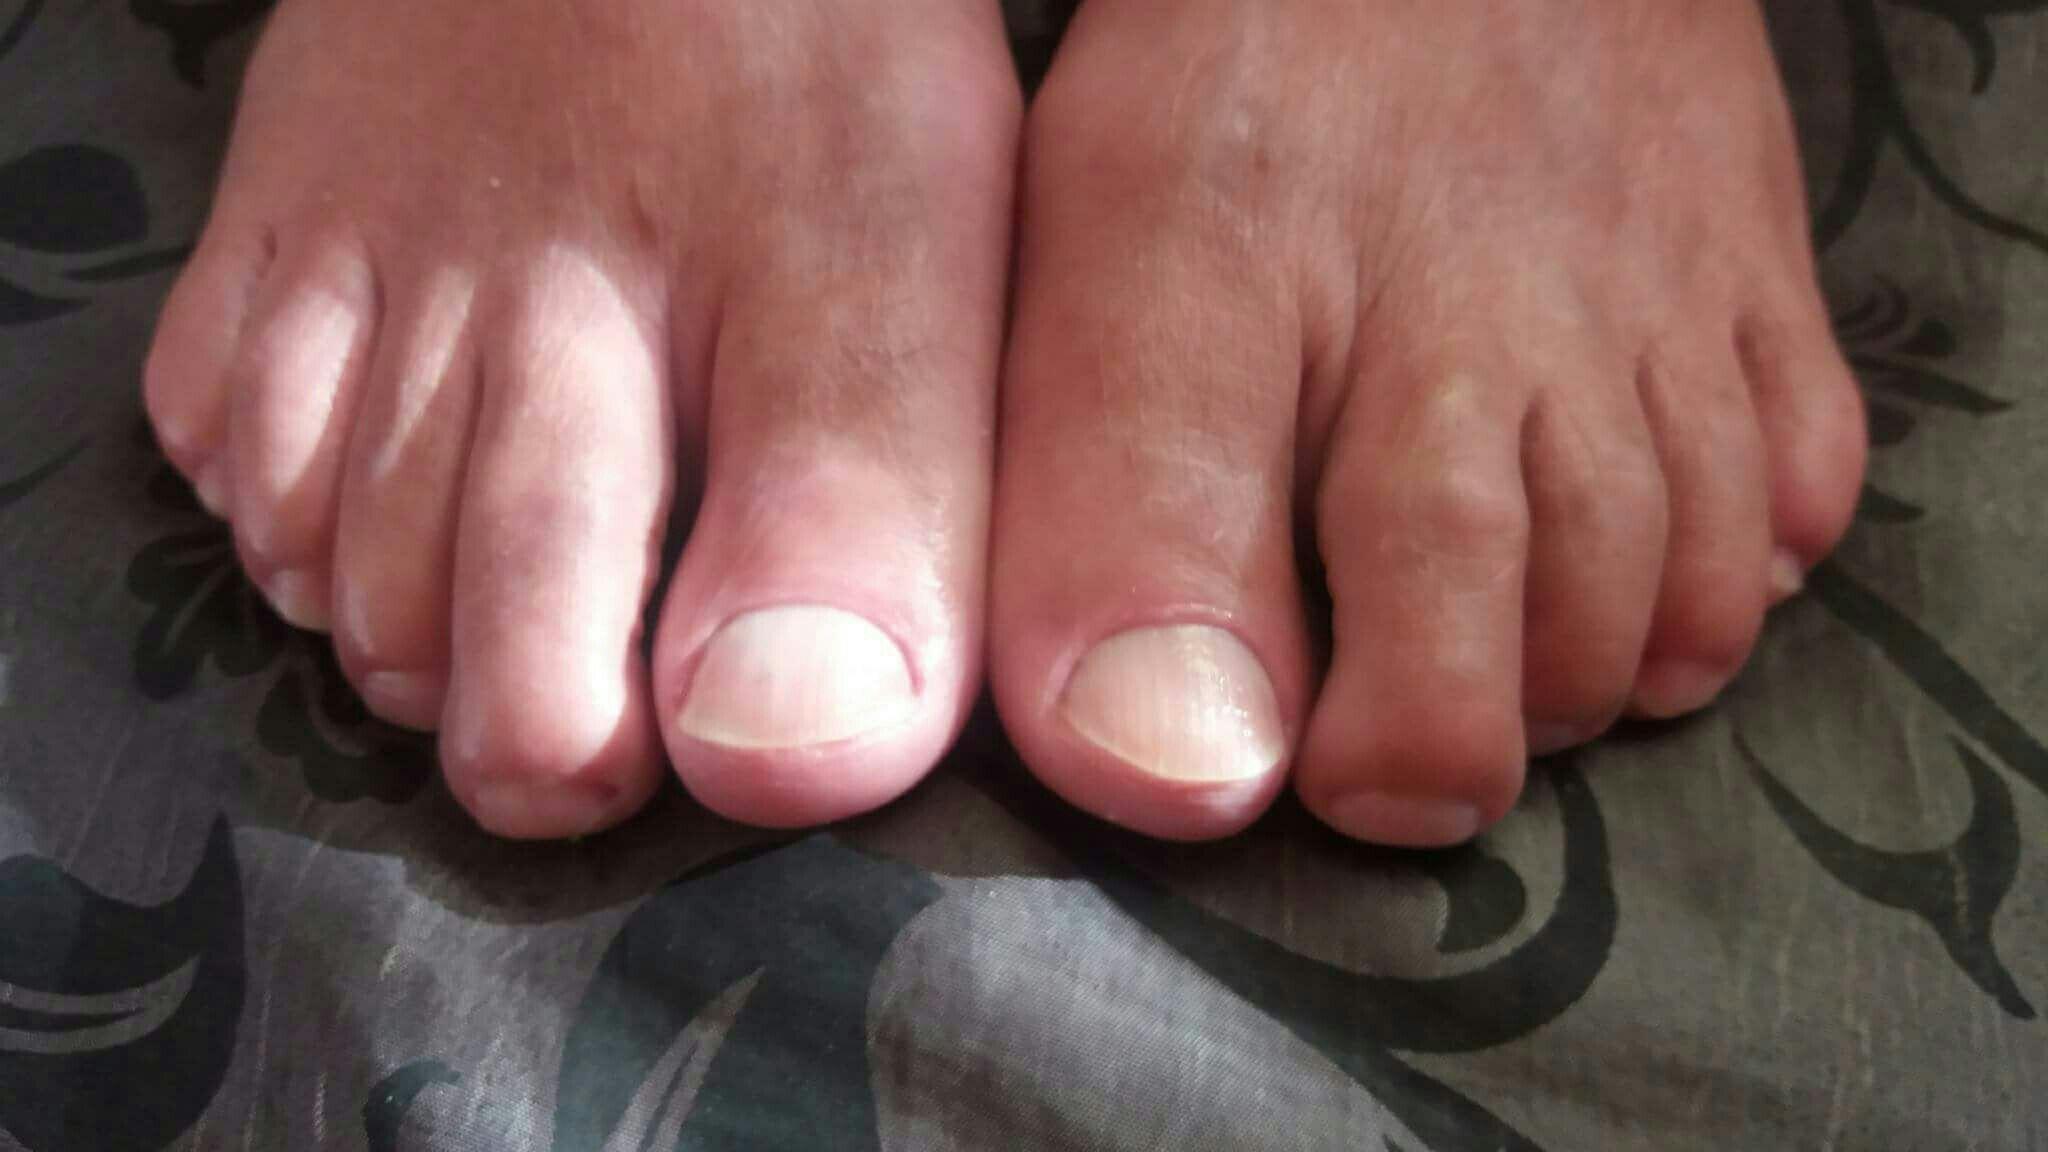 Pedicure Masculina unha manicure e pedicure estudante (manicure)